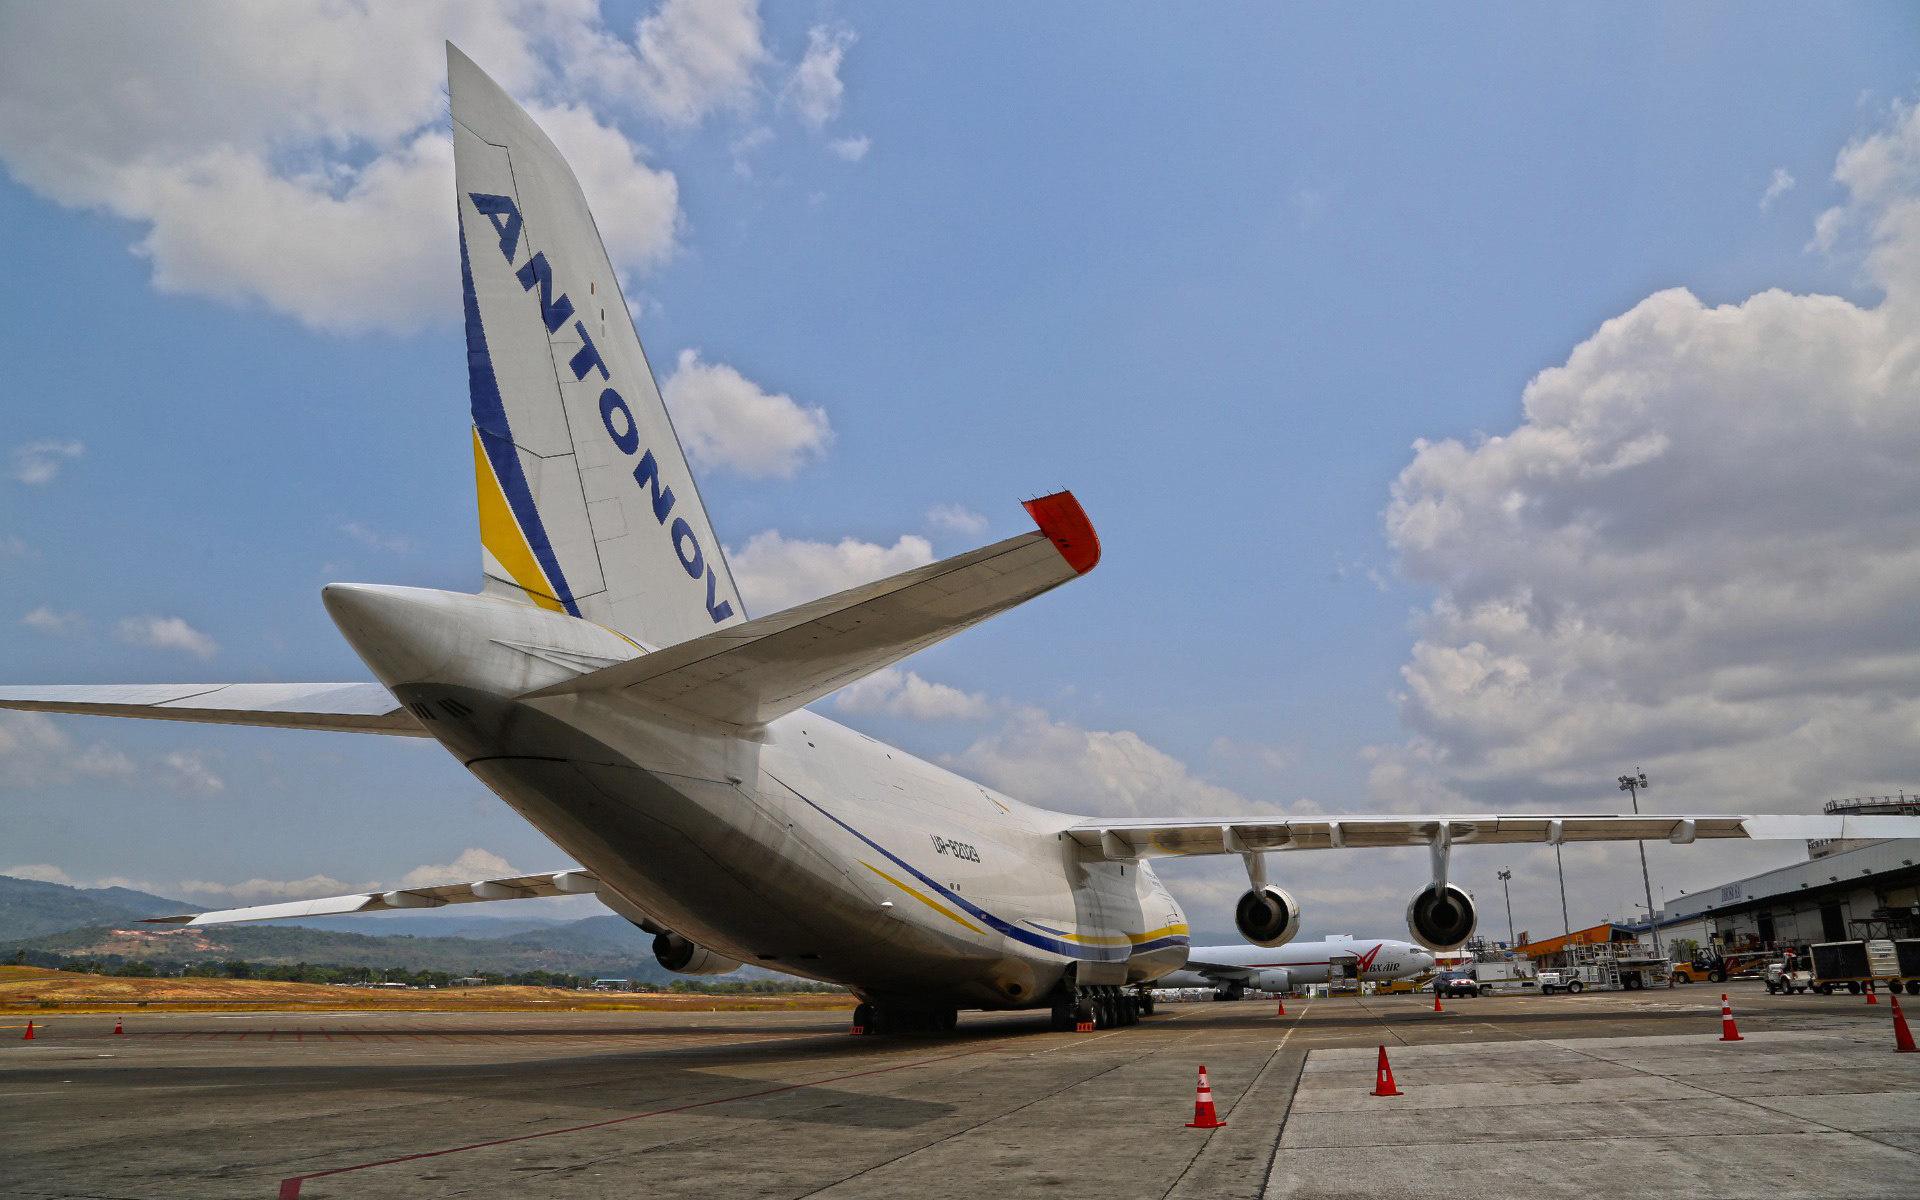 an 124, ан-124, ruslan, руслан, большой, грузовой, украина, синий, желтый, антонов, antonov